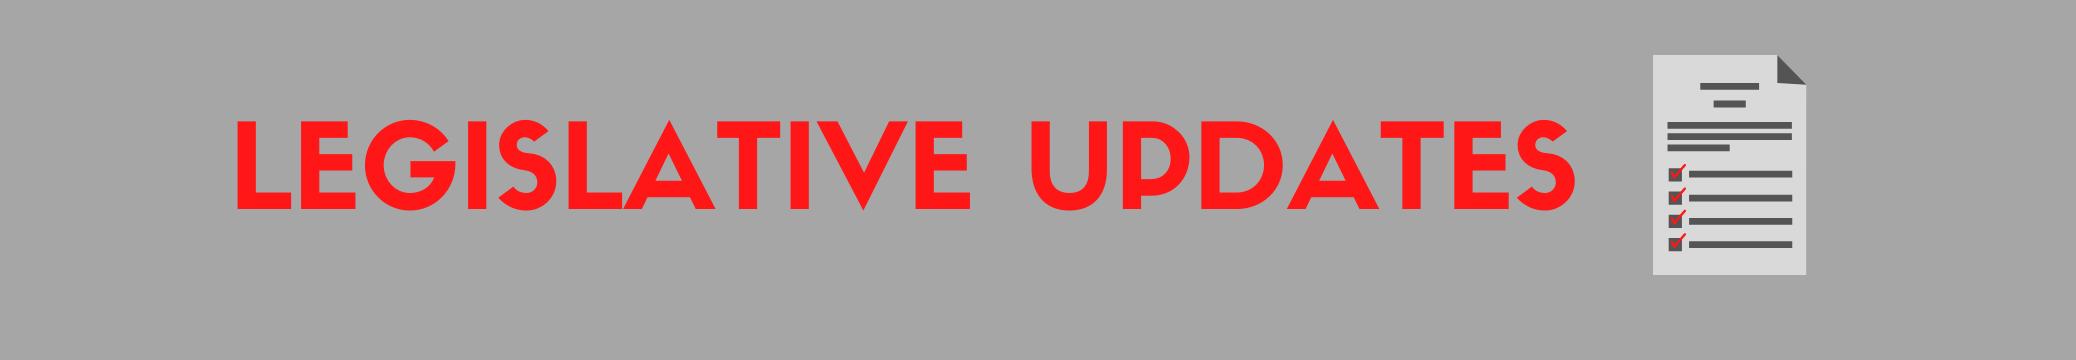 Legislative-Updates-Banner.png